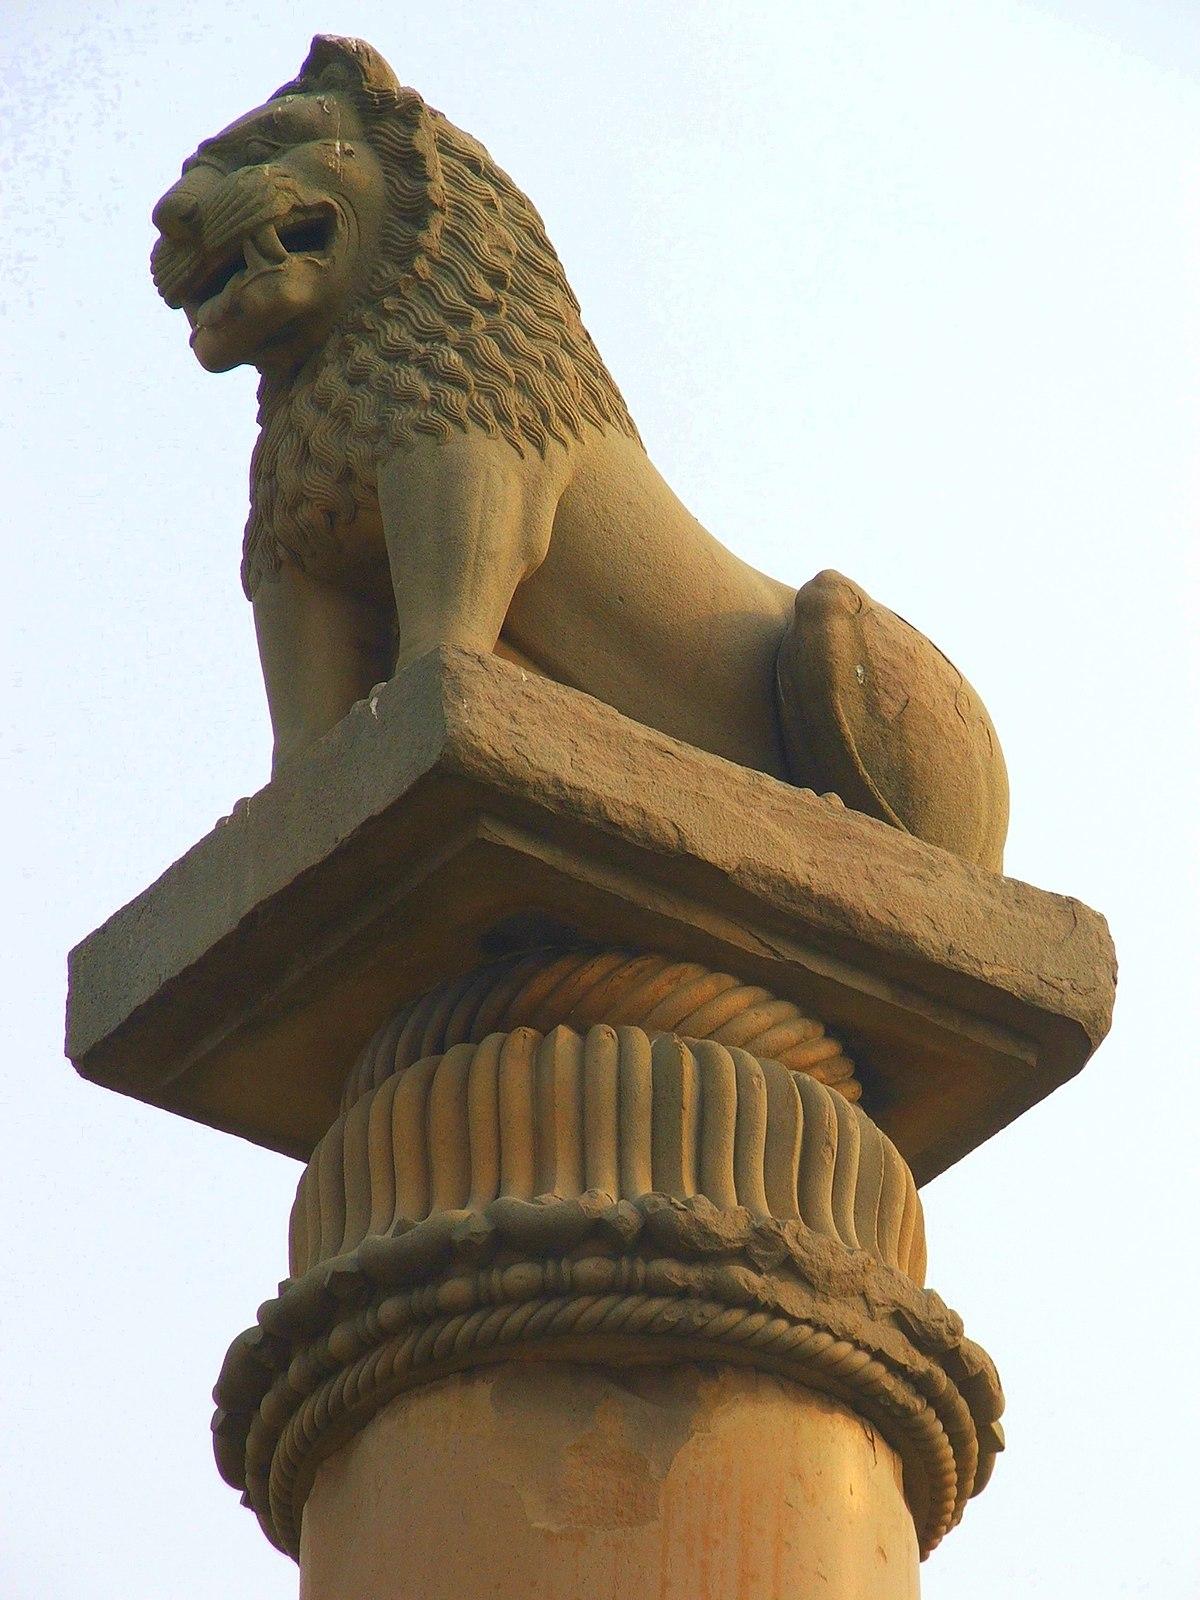 Ashoka's moral empire